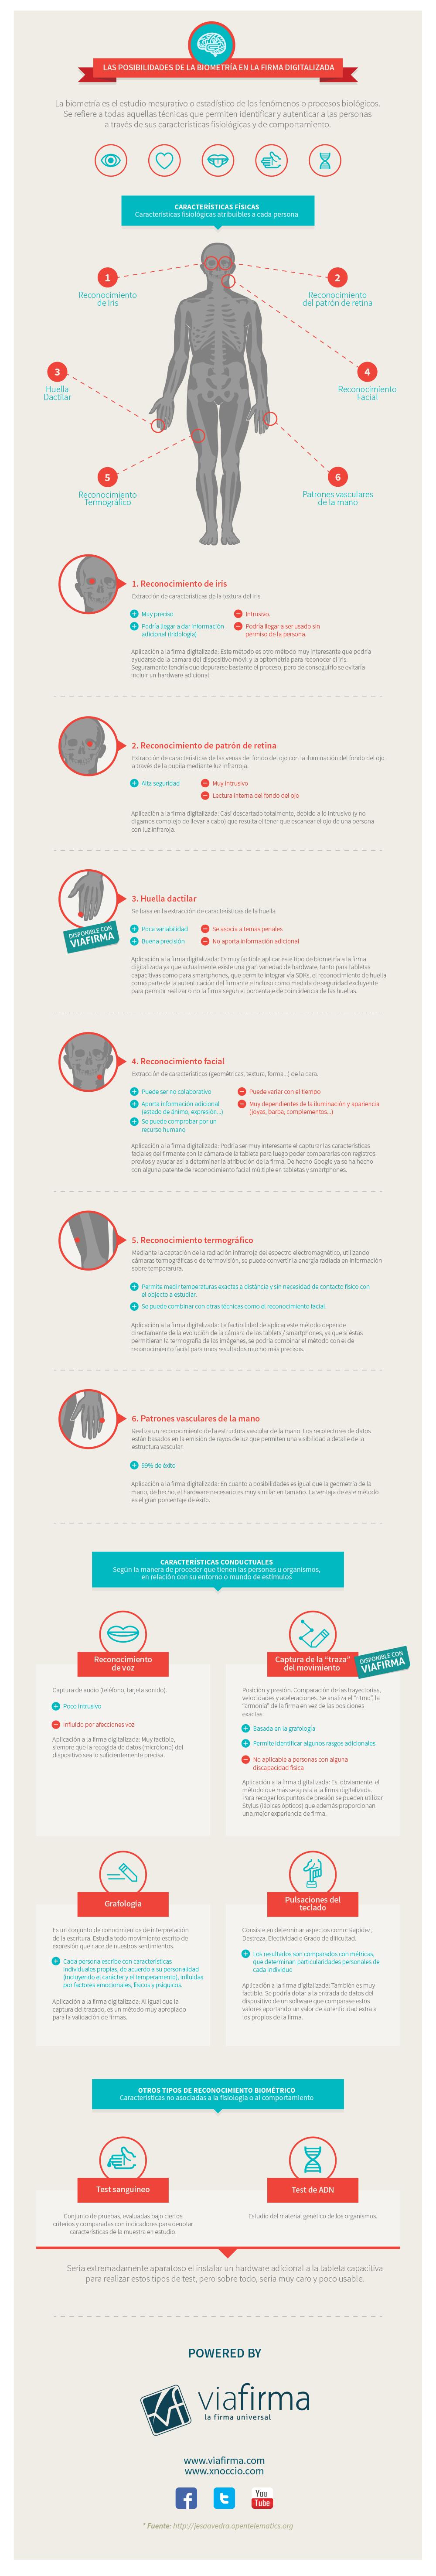 Posibilidades de la biometria en firma digitalizada